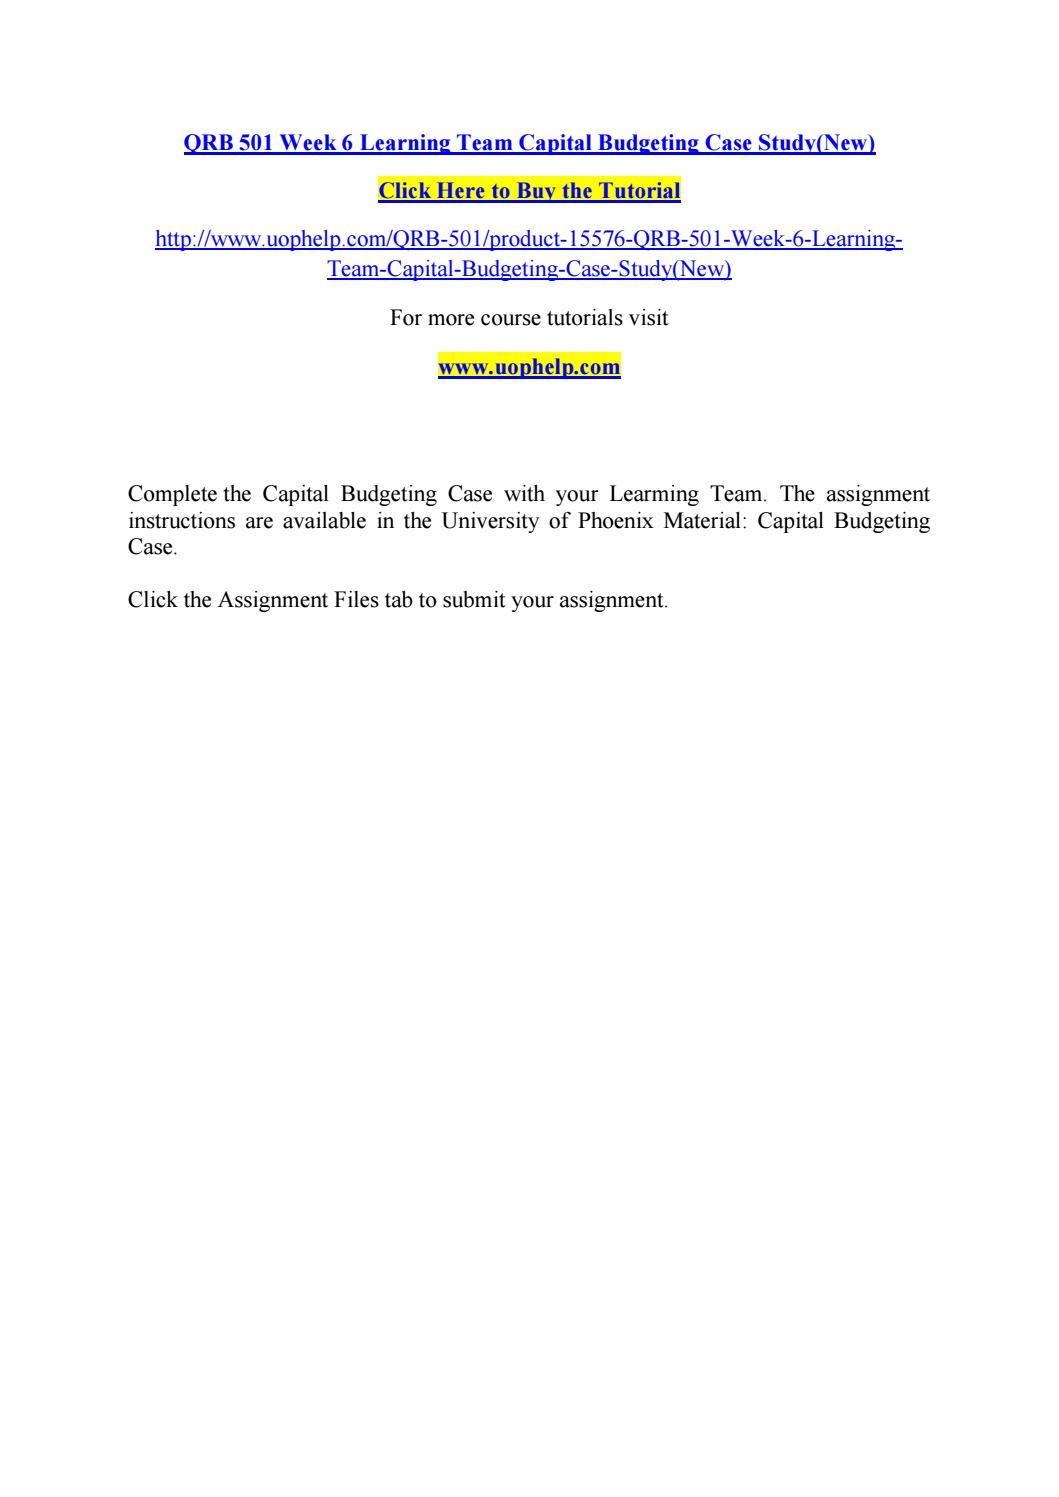 capital budgeting case study qrb 501